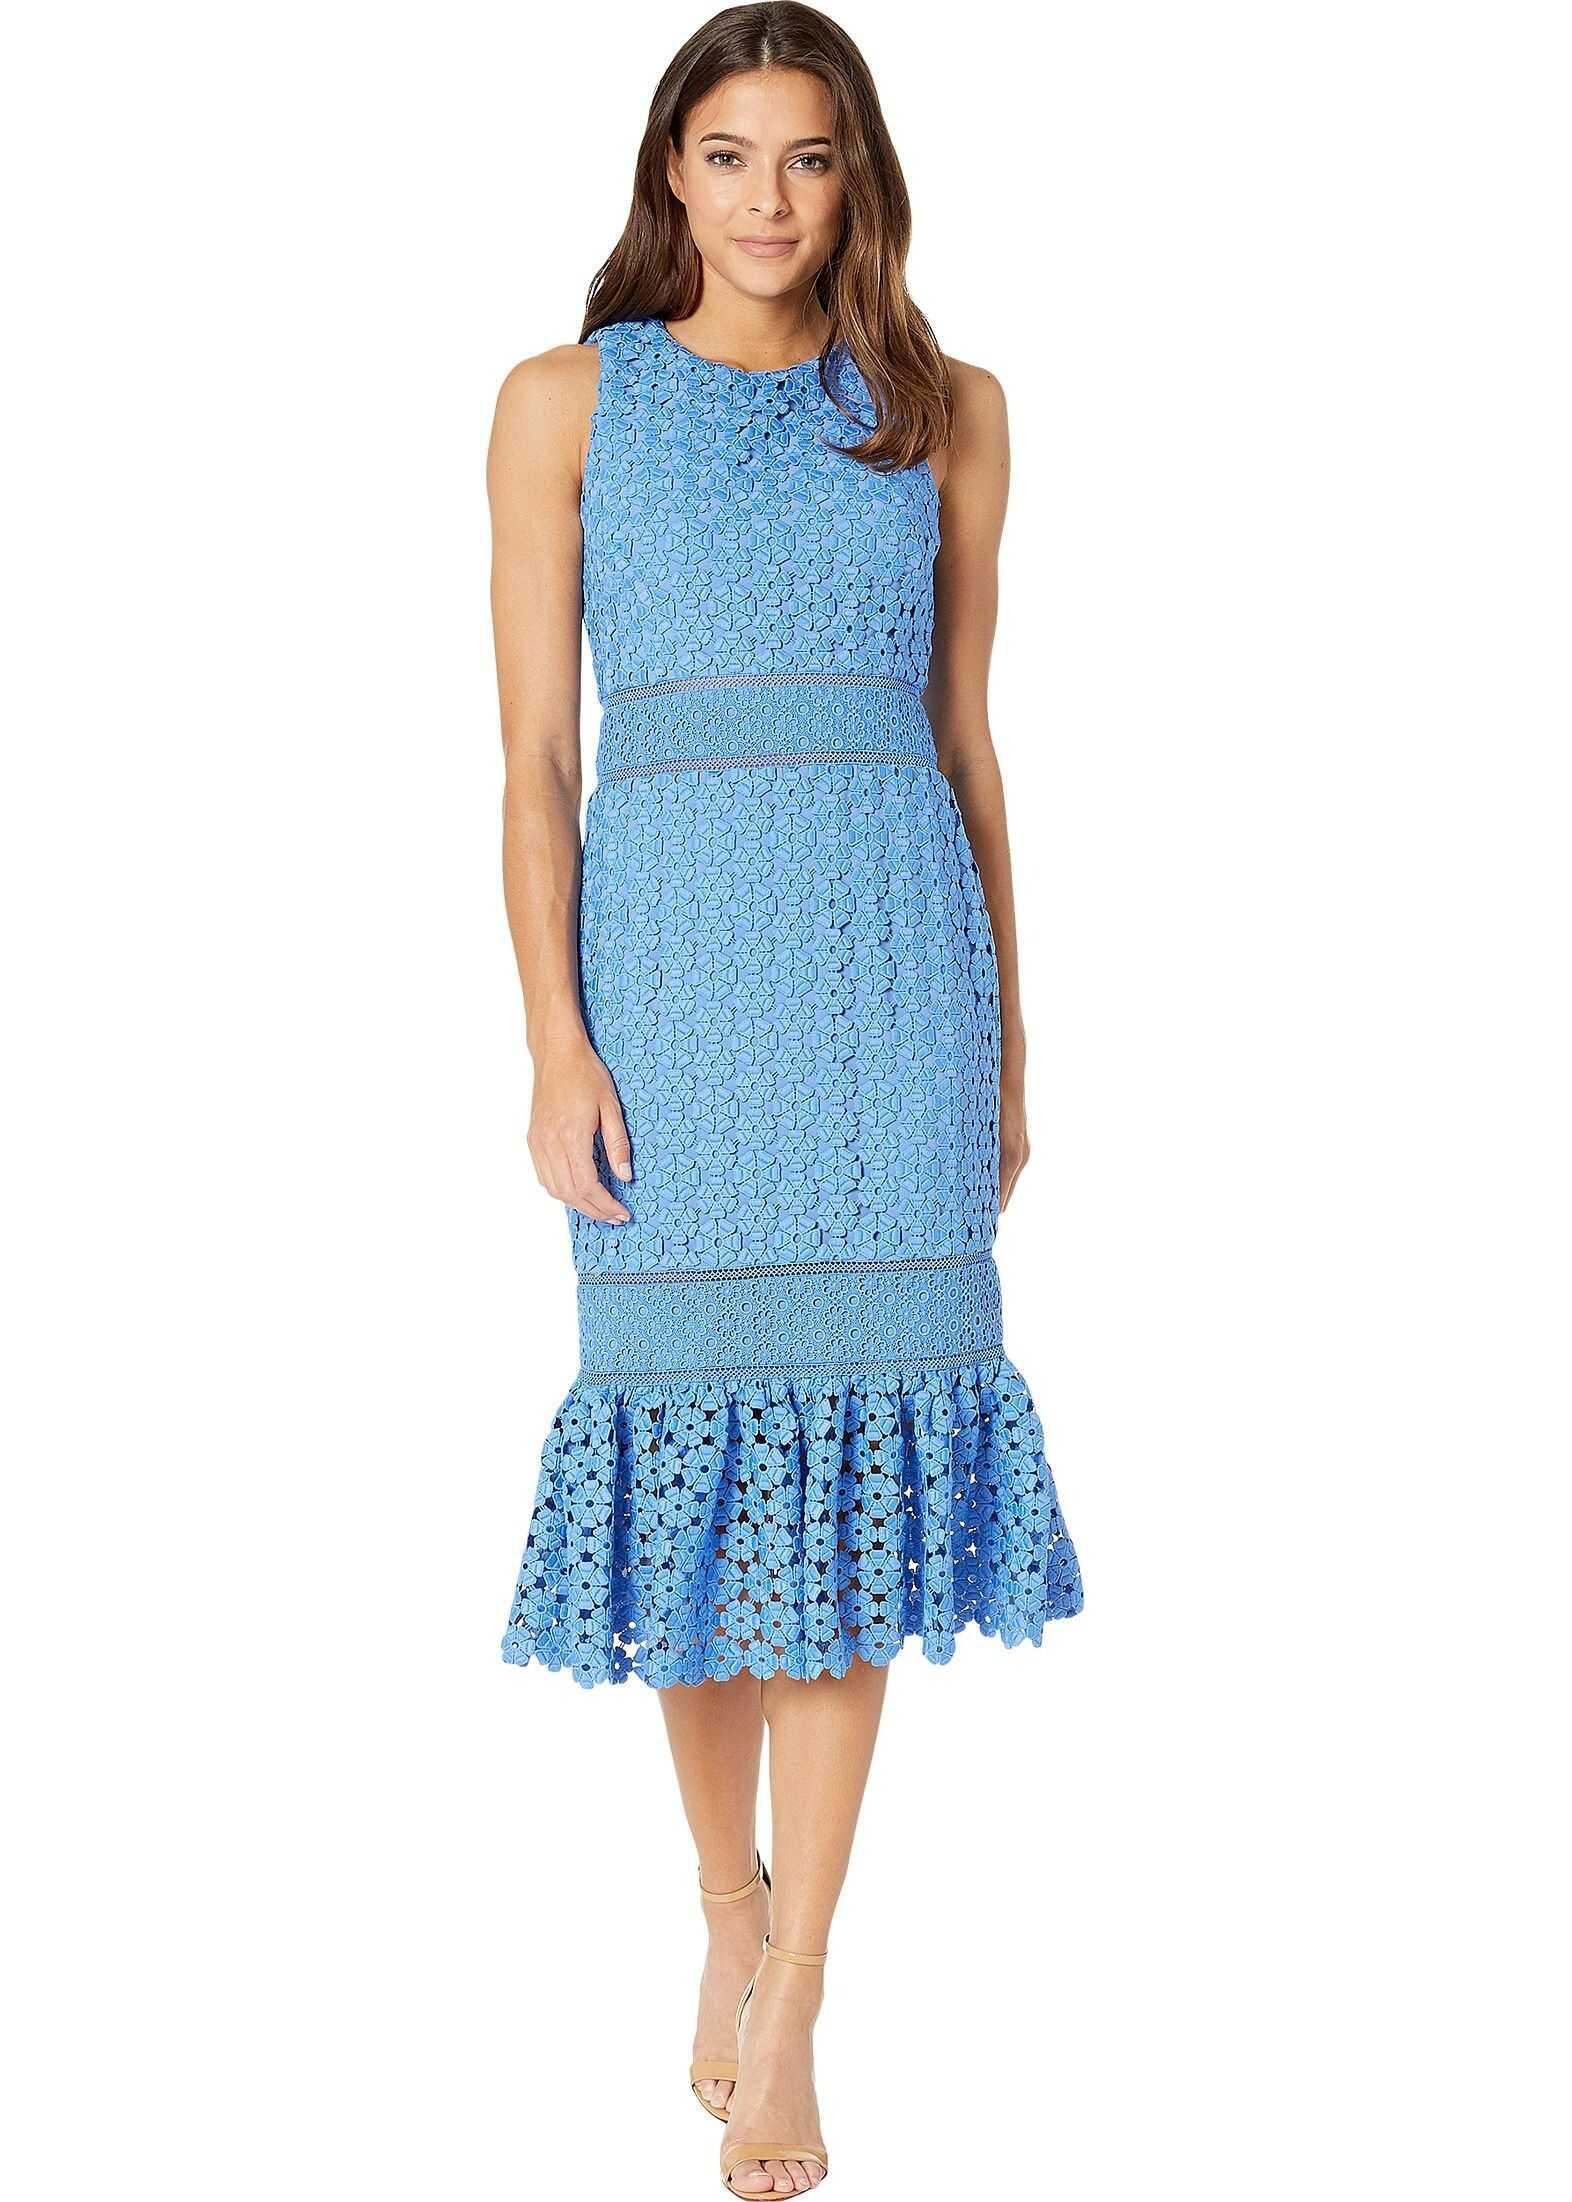 Badgley Mischka Combo Lace Flare Dress Cornflower Blue